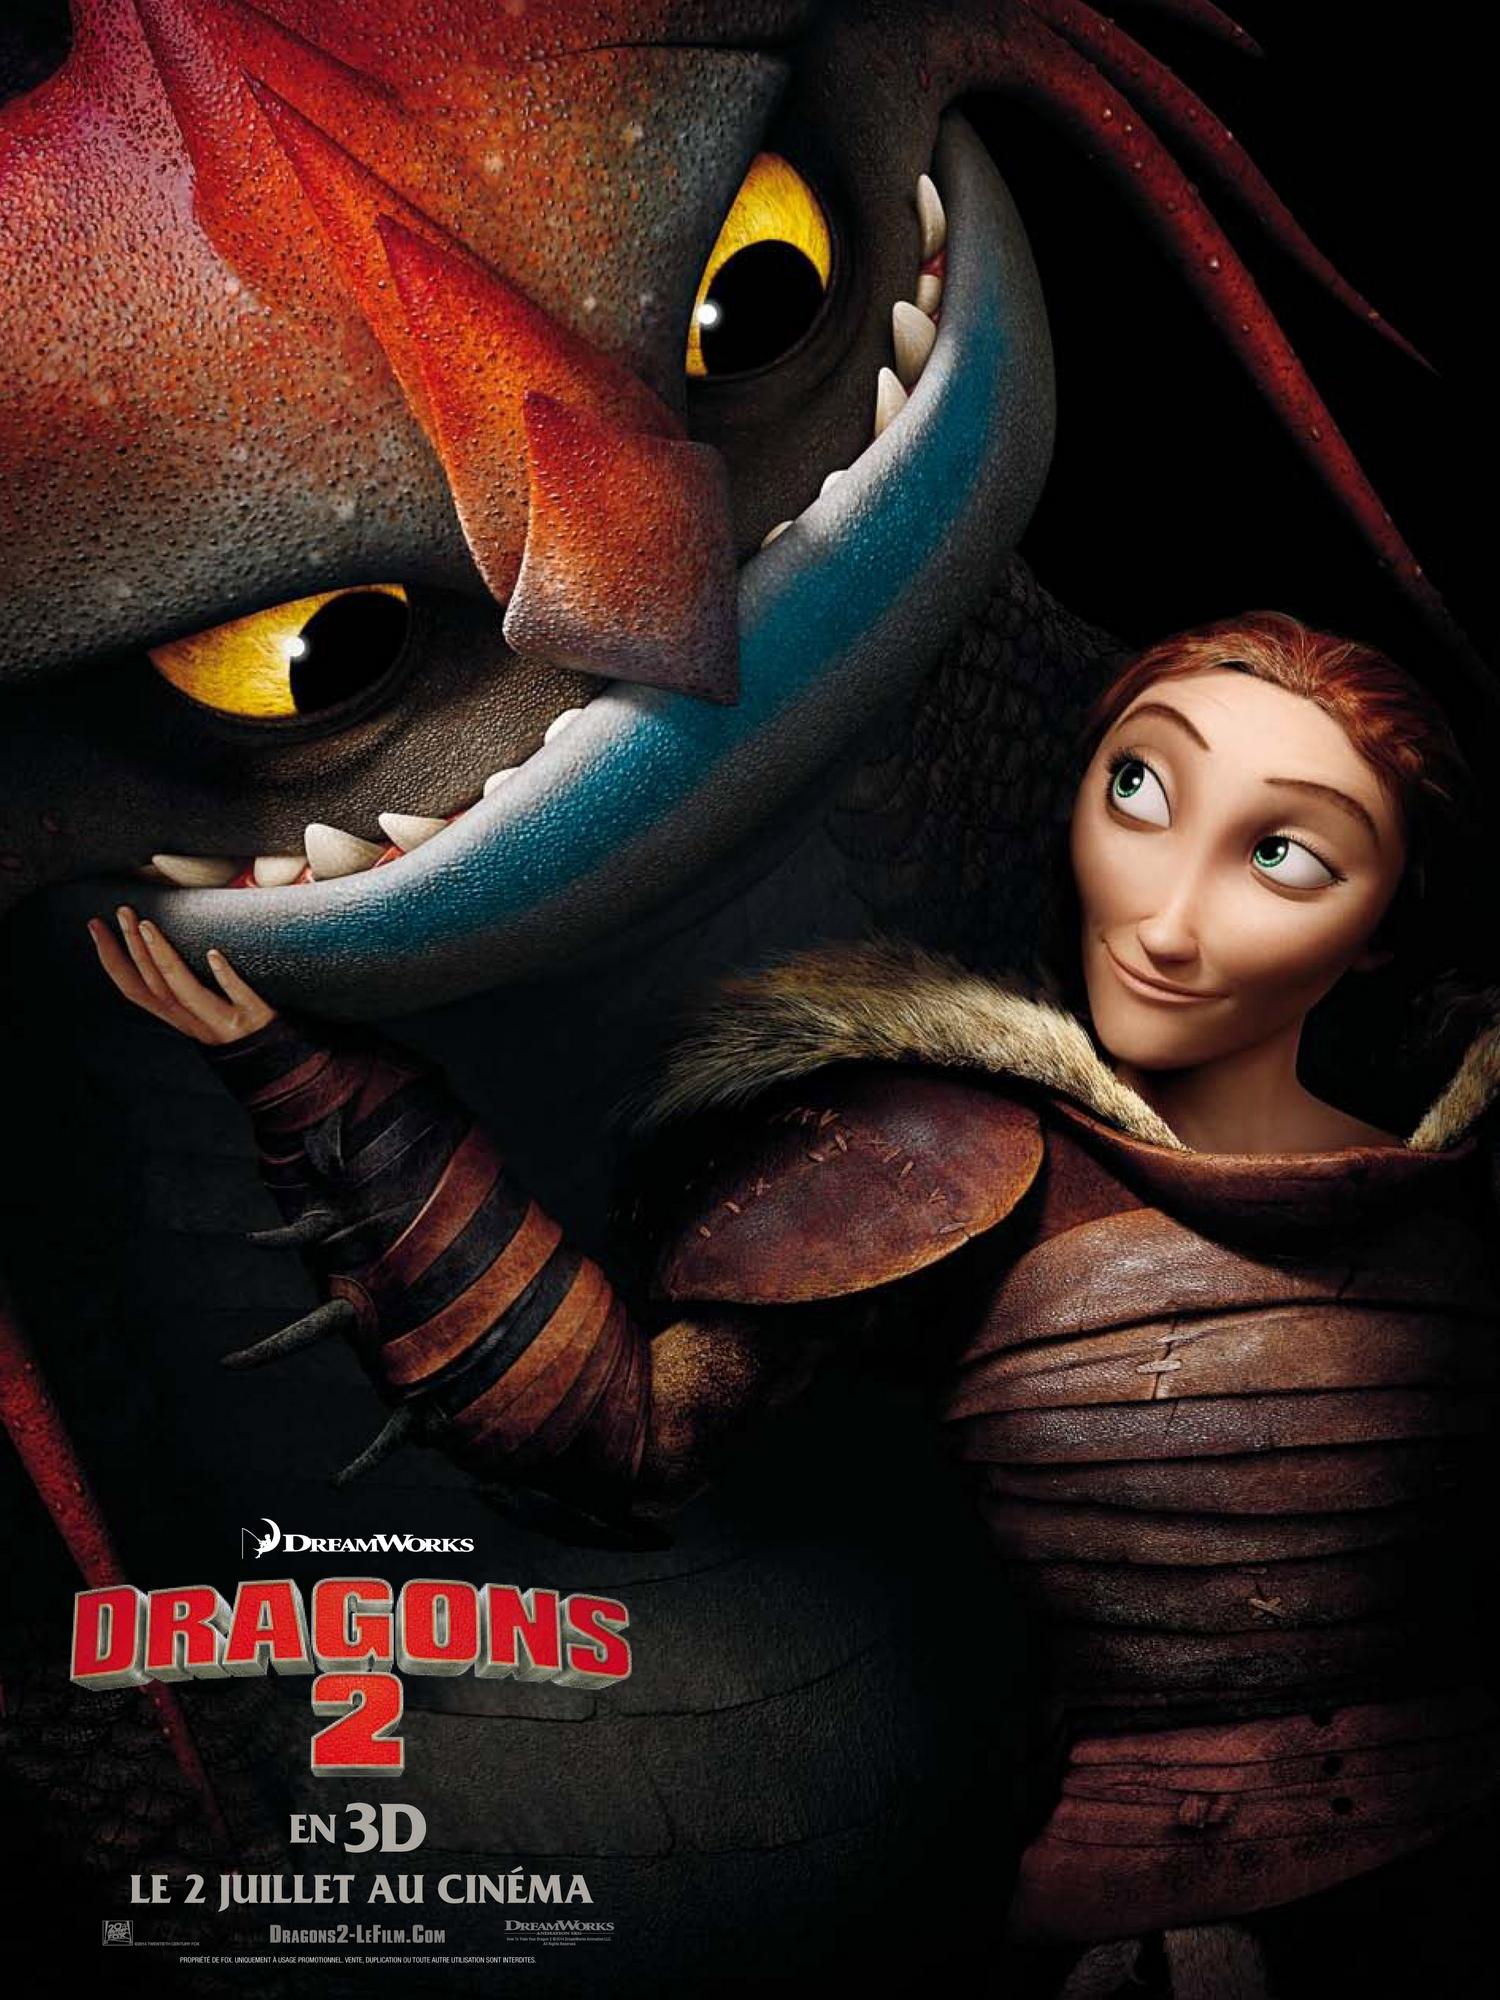 Dragons-perso-6.jpg